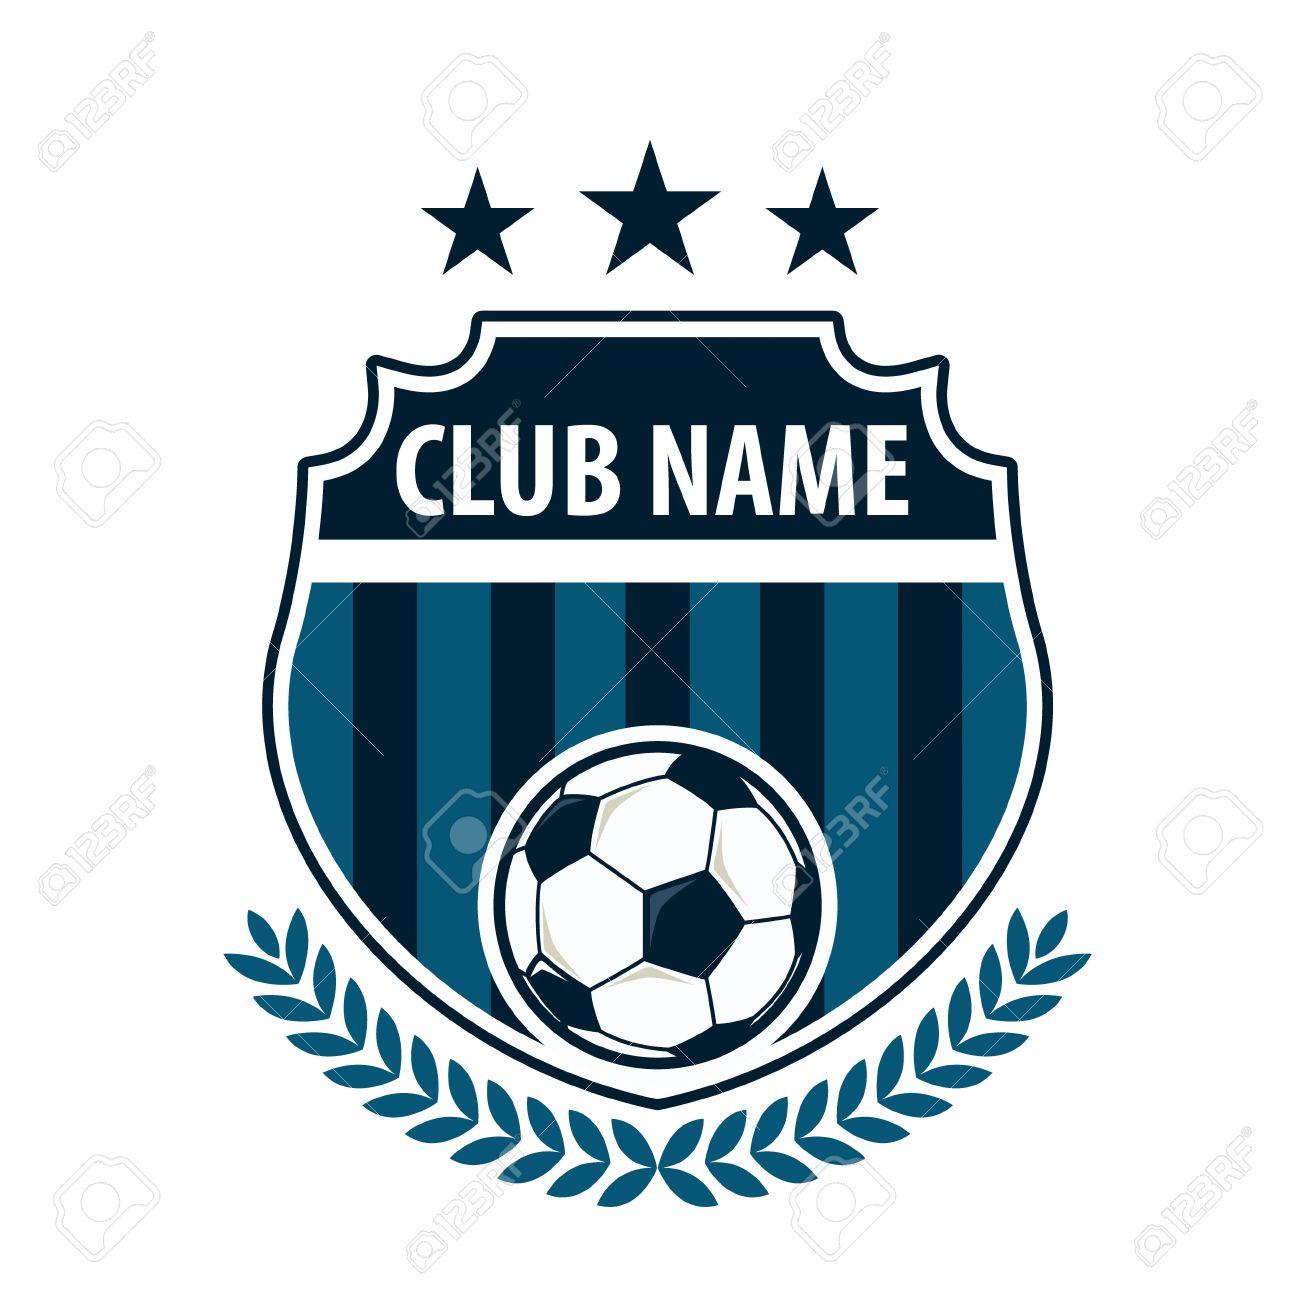 Football Badge Logo Template Designsoccer Teamvector Illuatration